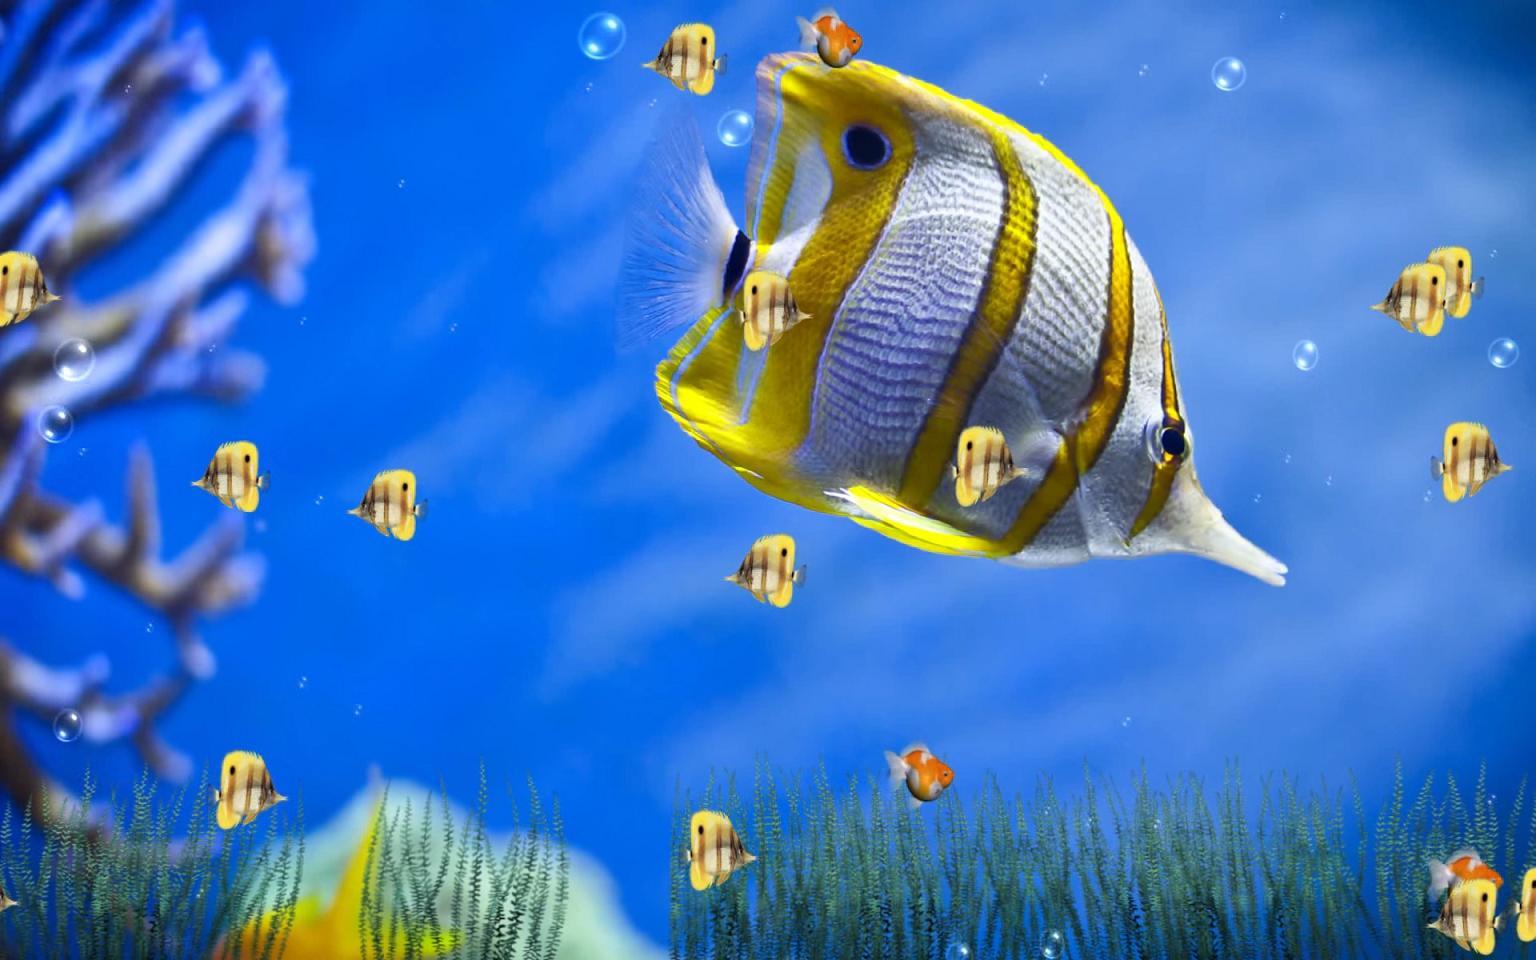 marine life aquarium animated wallpaper desktop wallpapers 467089jpeg 1536x960